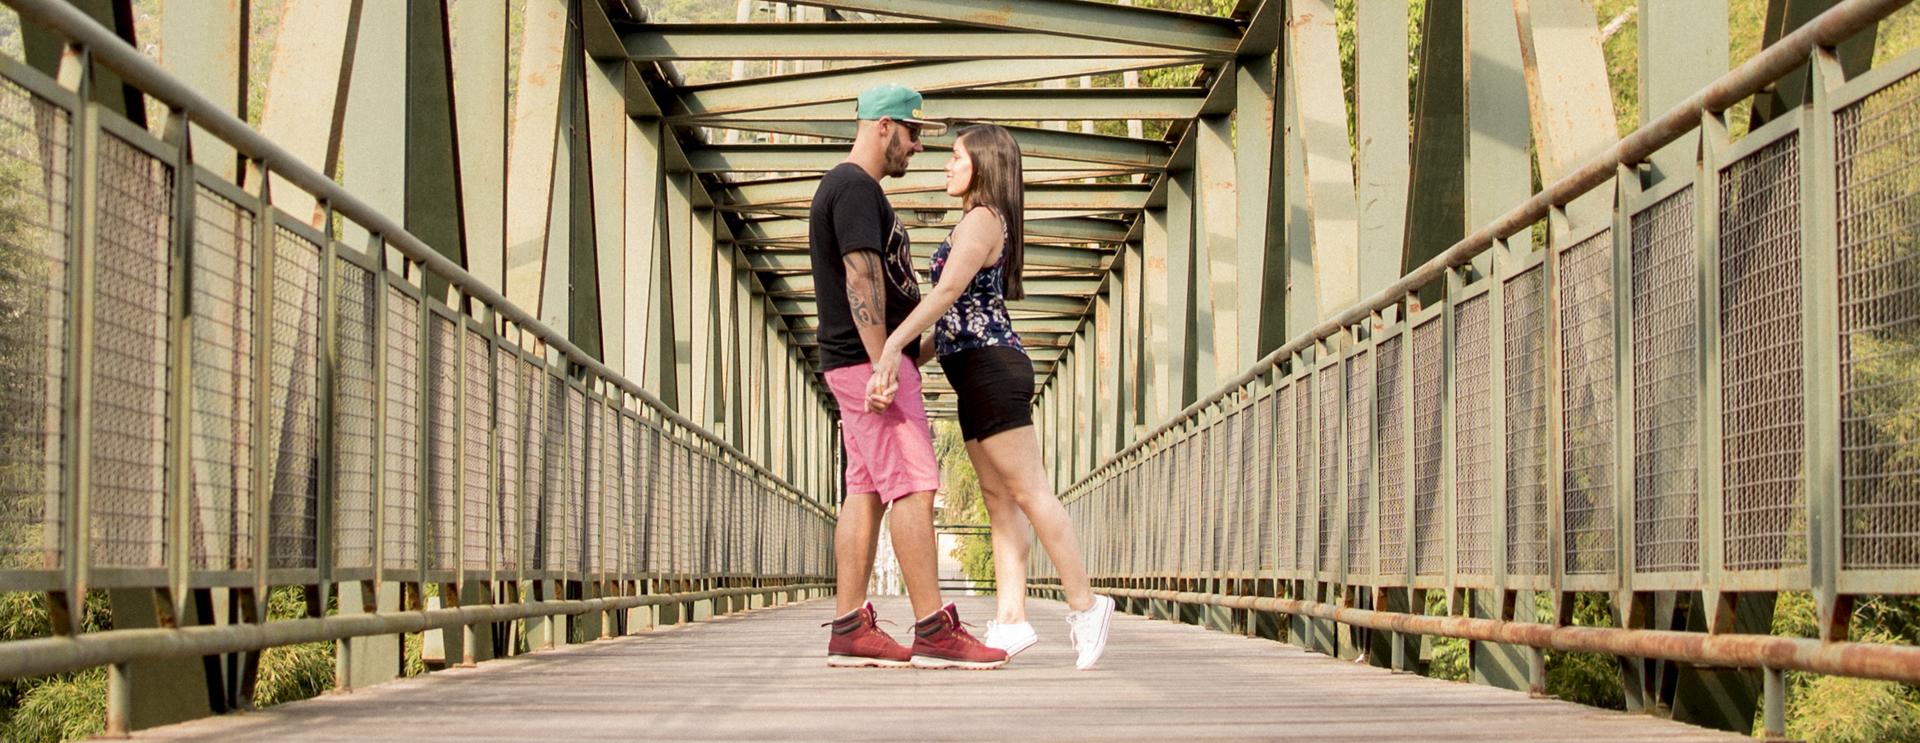 Jenifer e Sergio – Video Clipe